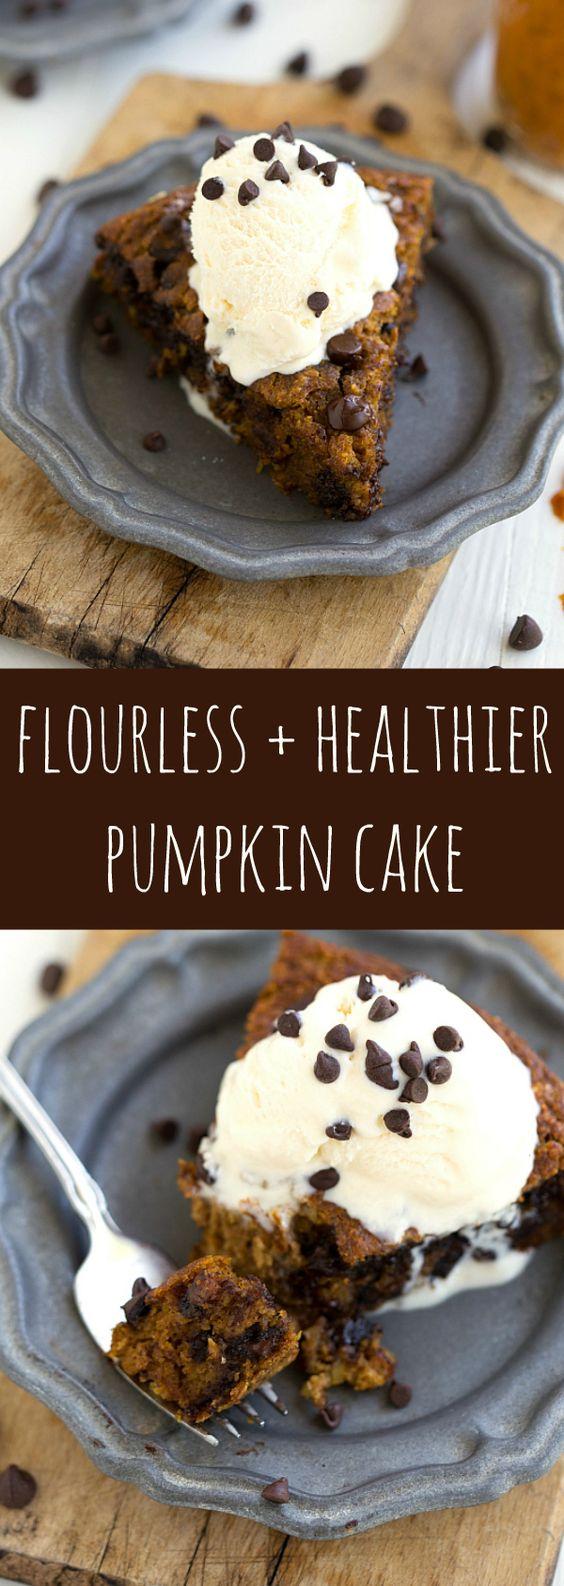 The BEST healthier and flourless pumpkin cake -- no flour, butter, and much lower sugar. Gluten free recipe